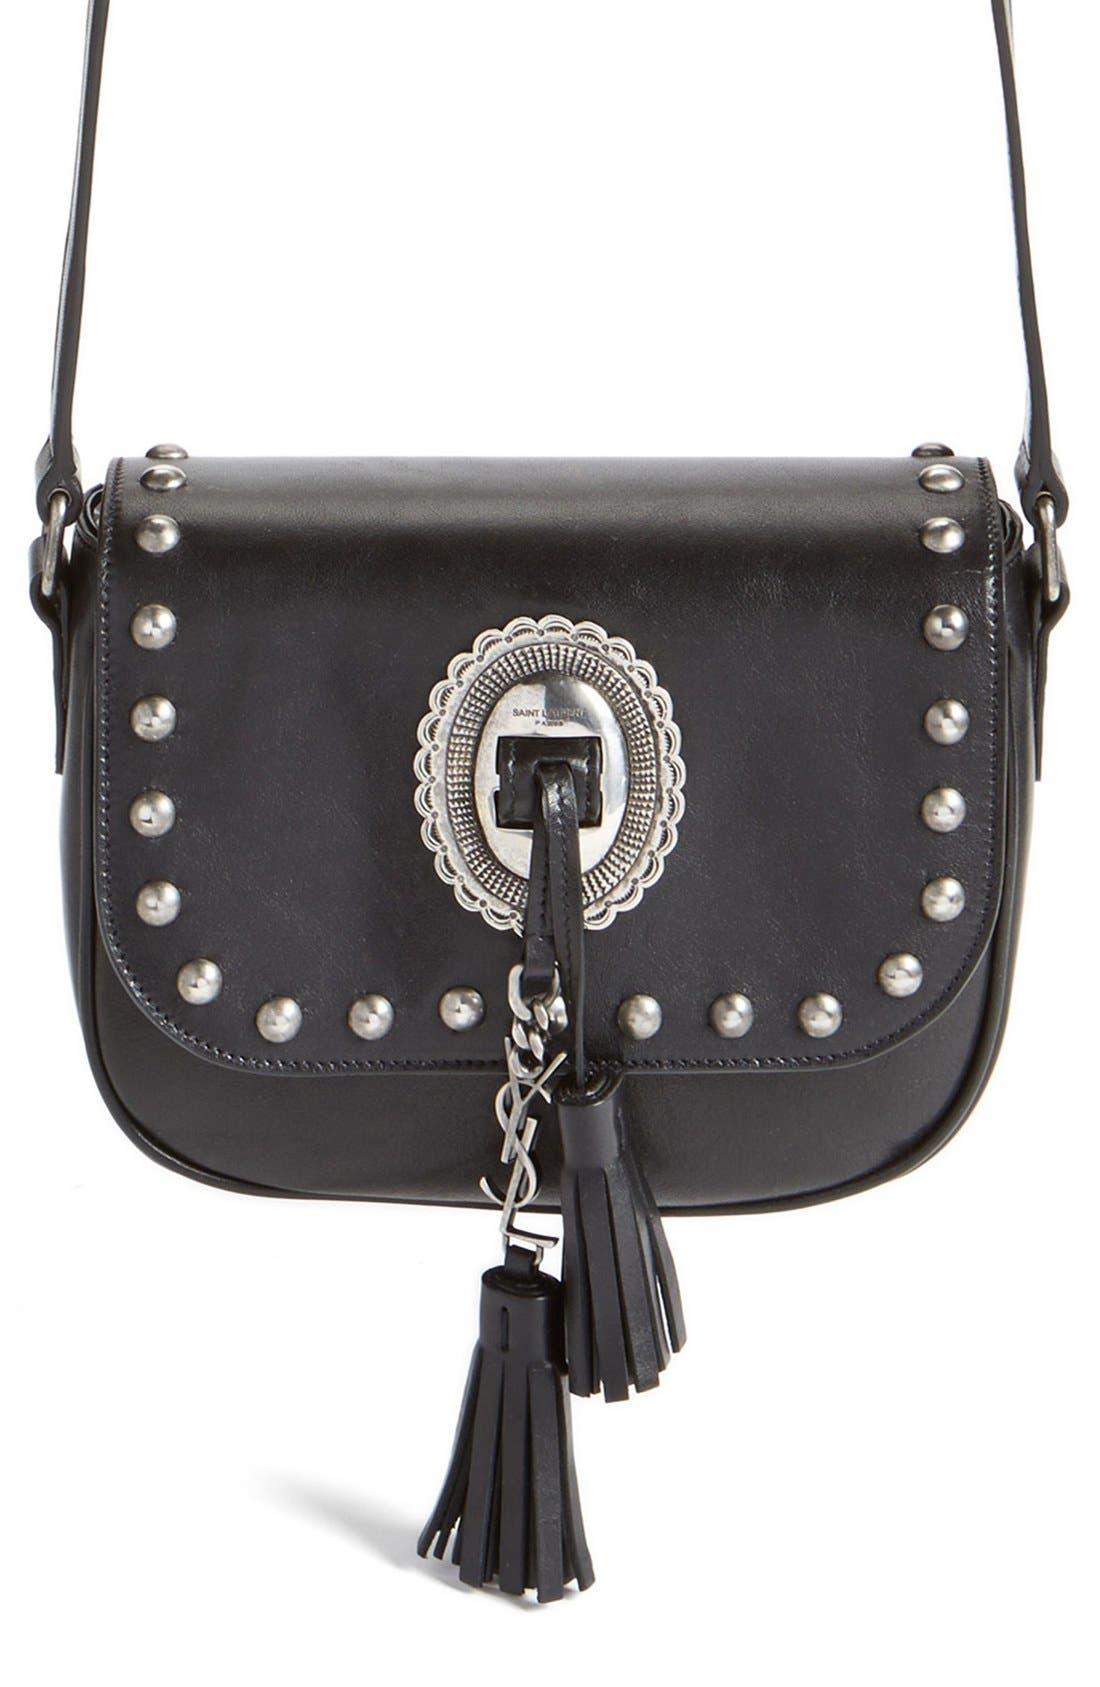 SAINT LAURENT 'Small Kim' Calfskin Crossbody Bag